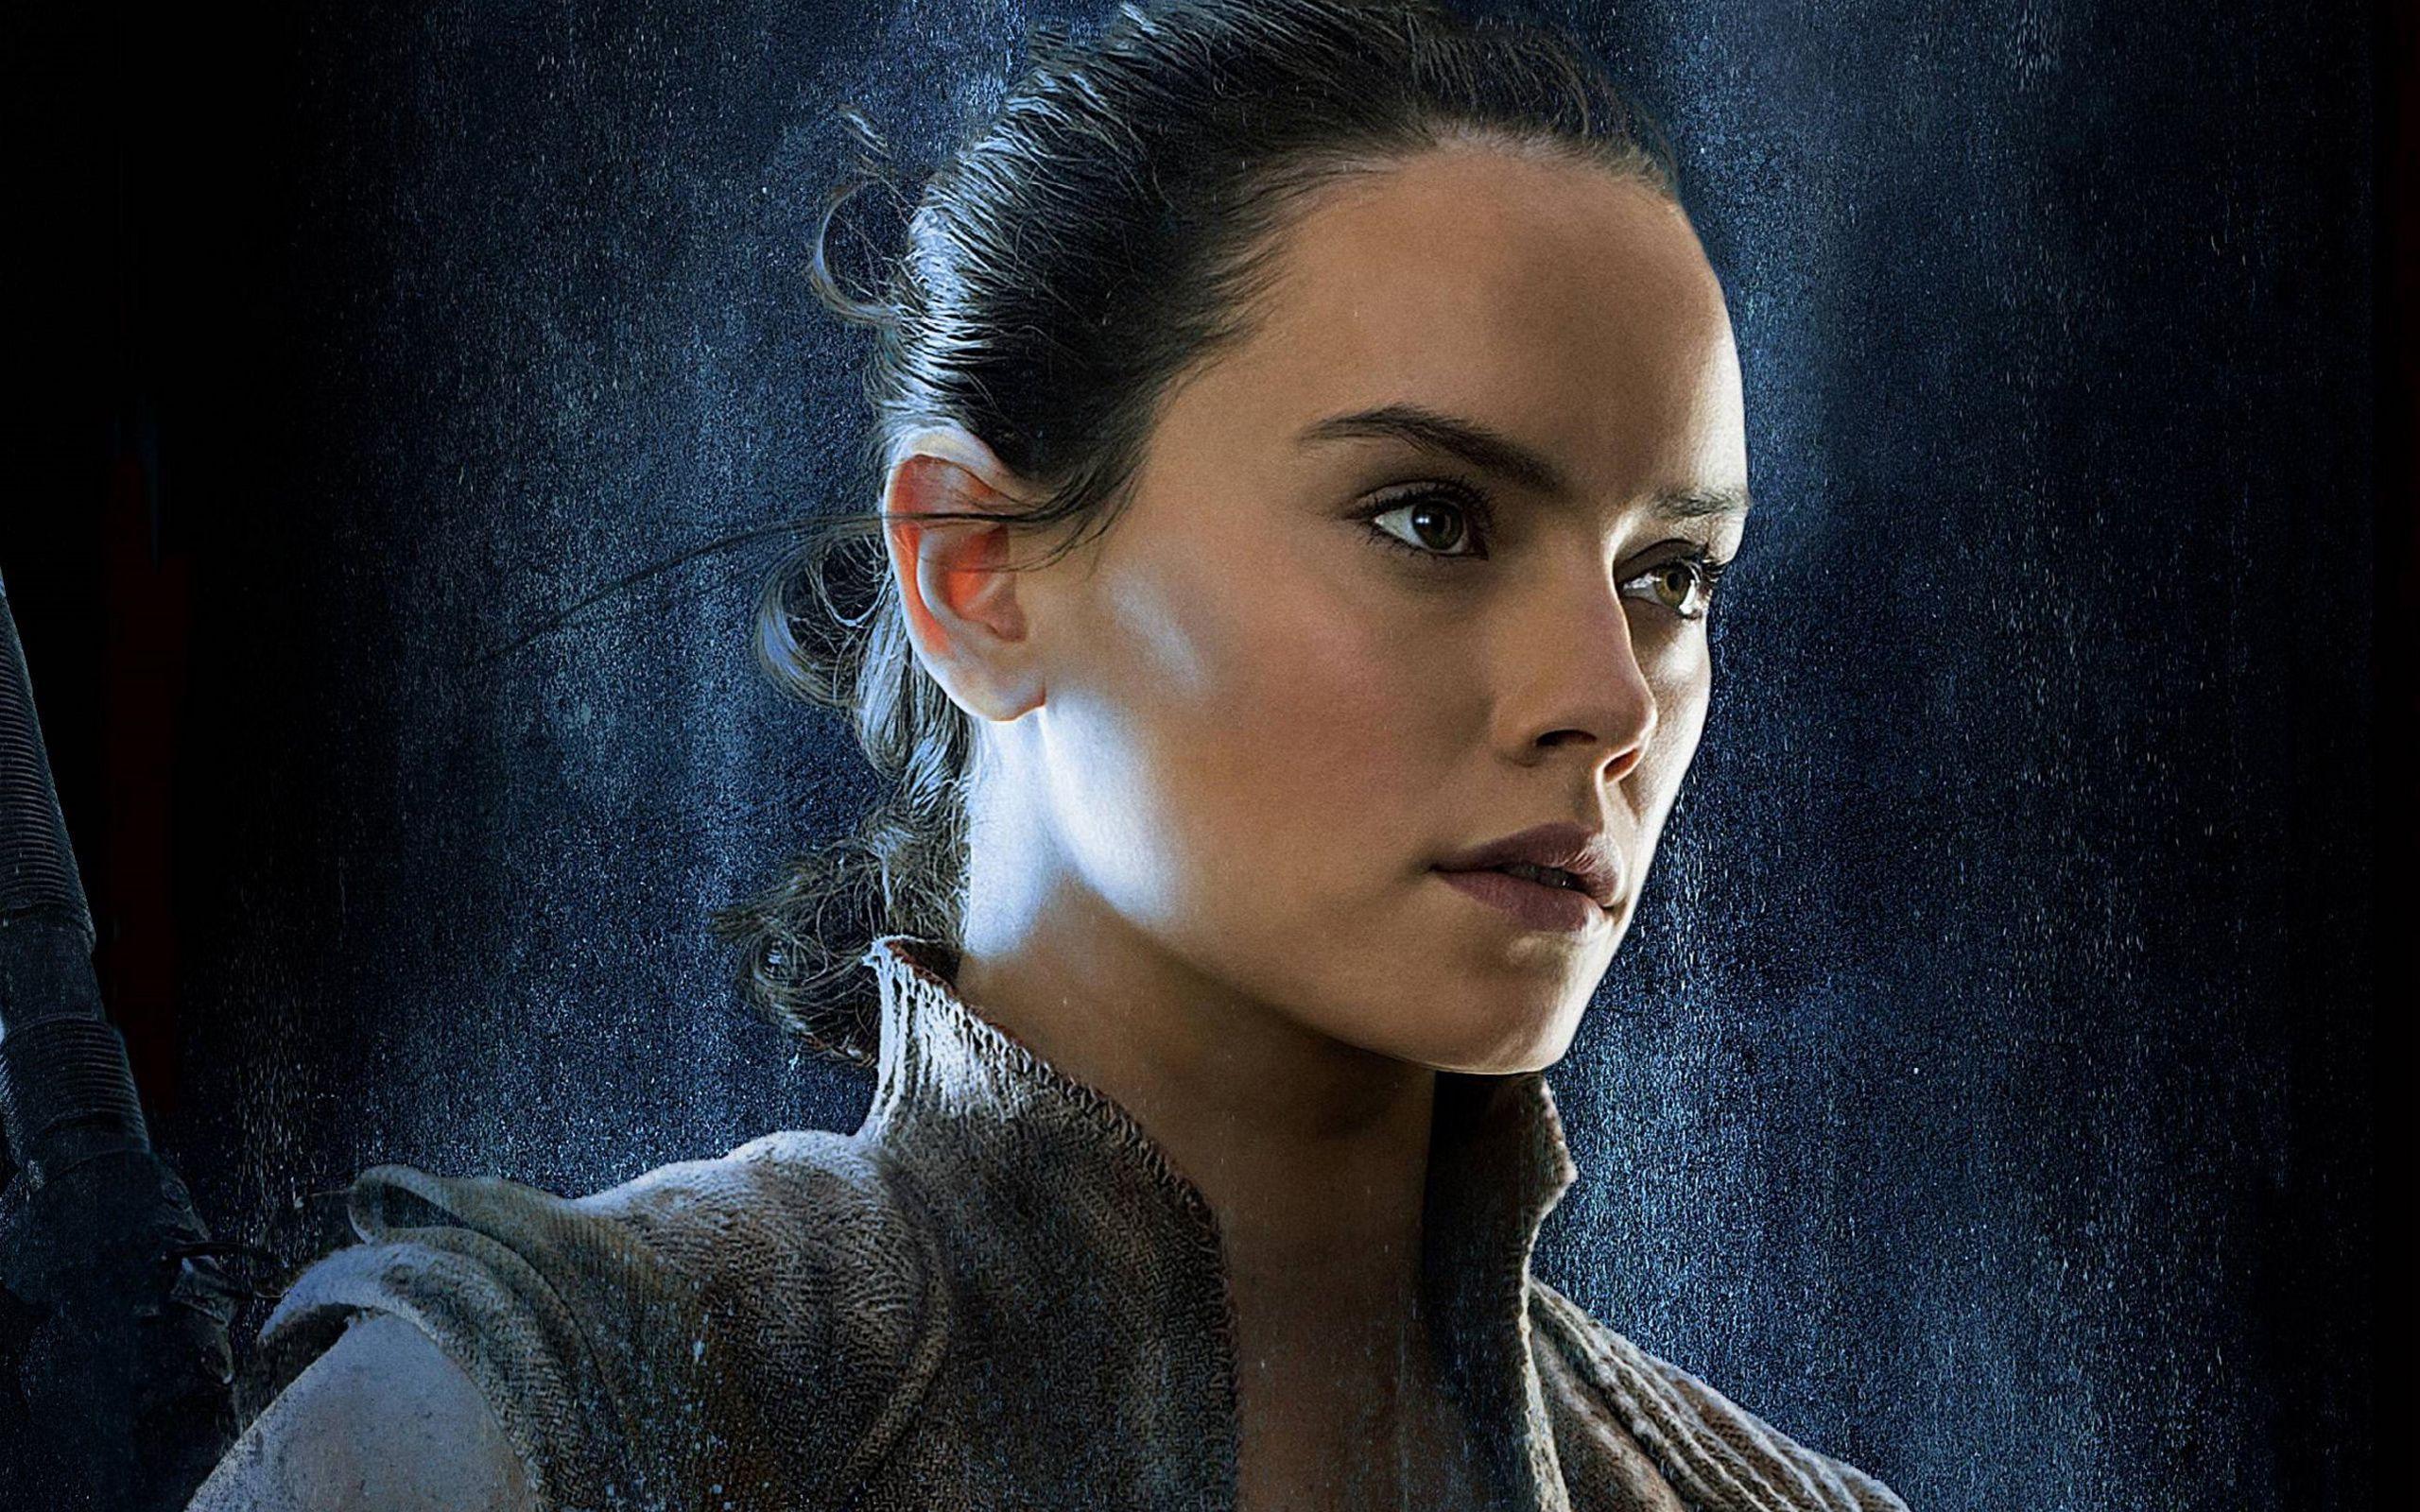 Daisy Ridley As Rey Star Wars The Last Jedi Wallpaper